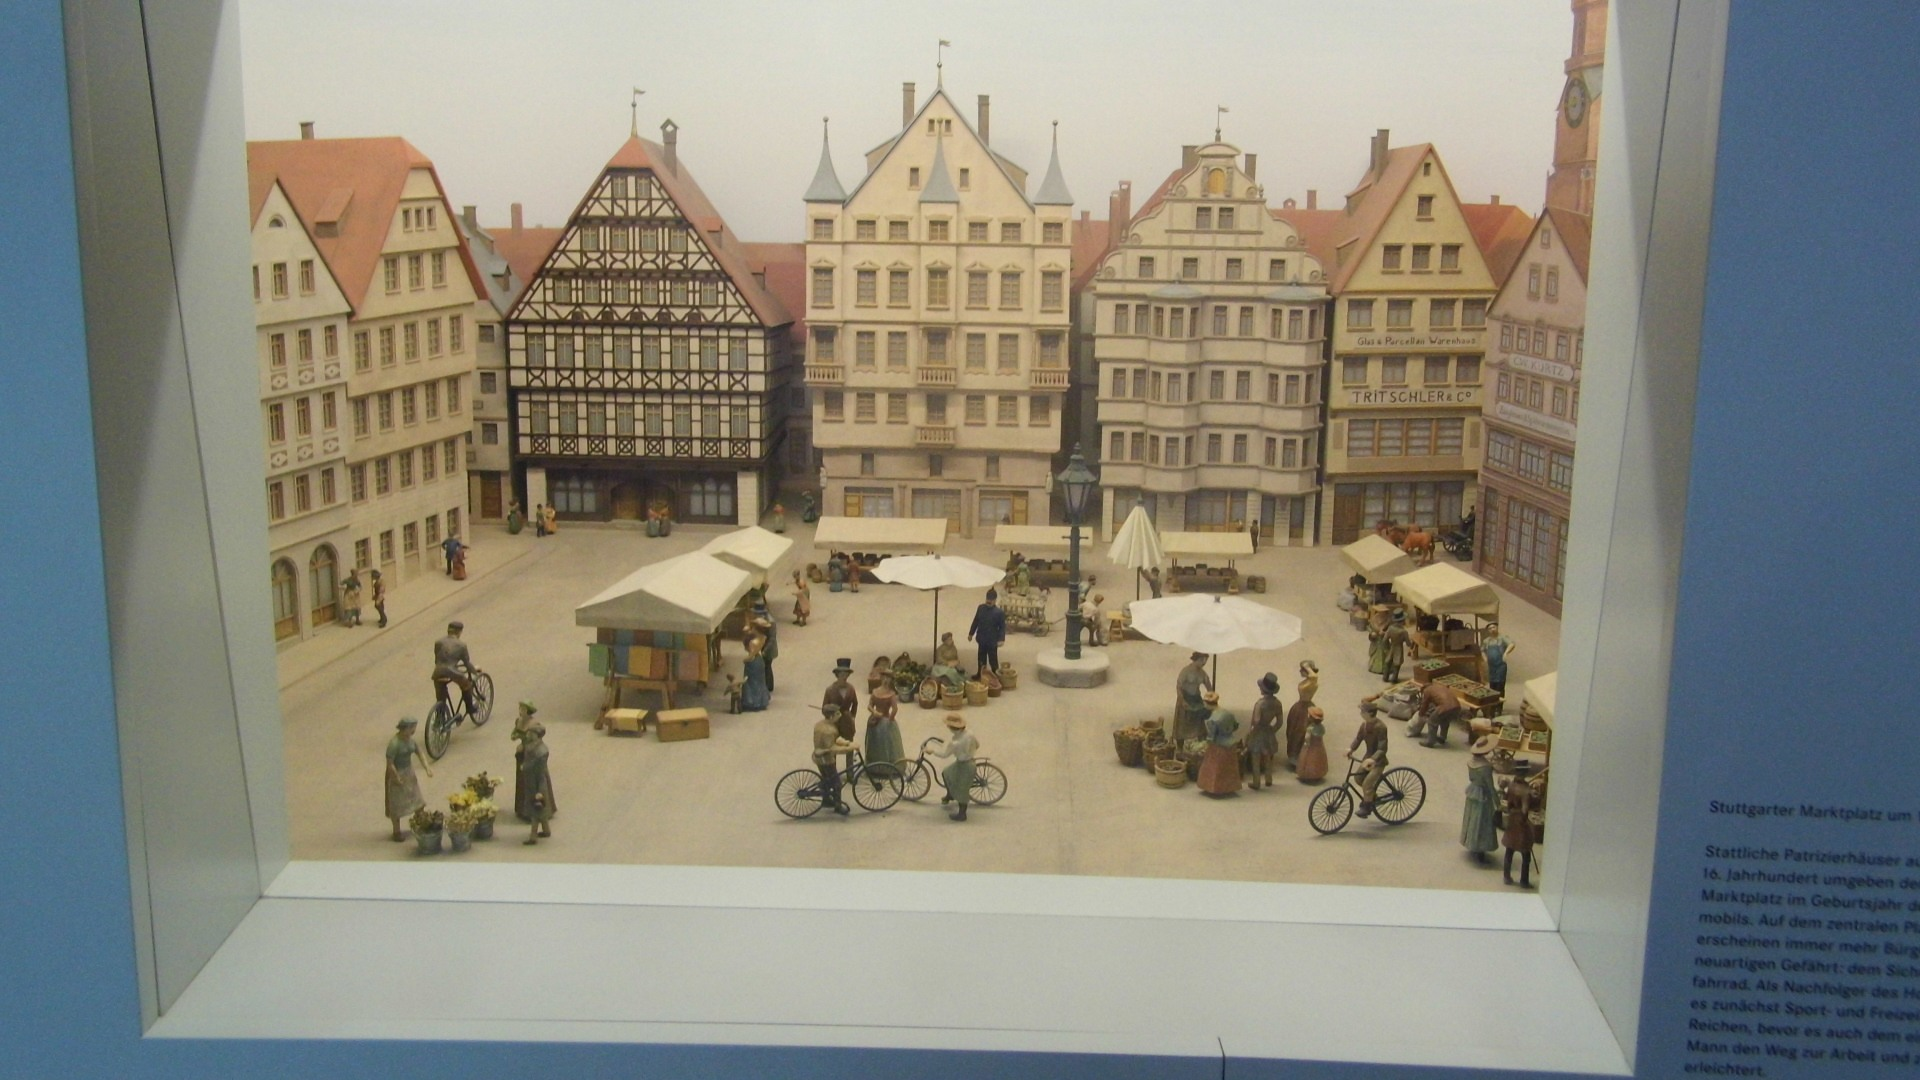 Suttgarter Marktplatz 1890